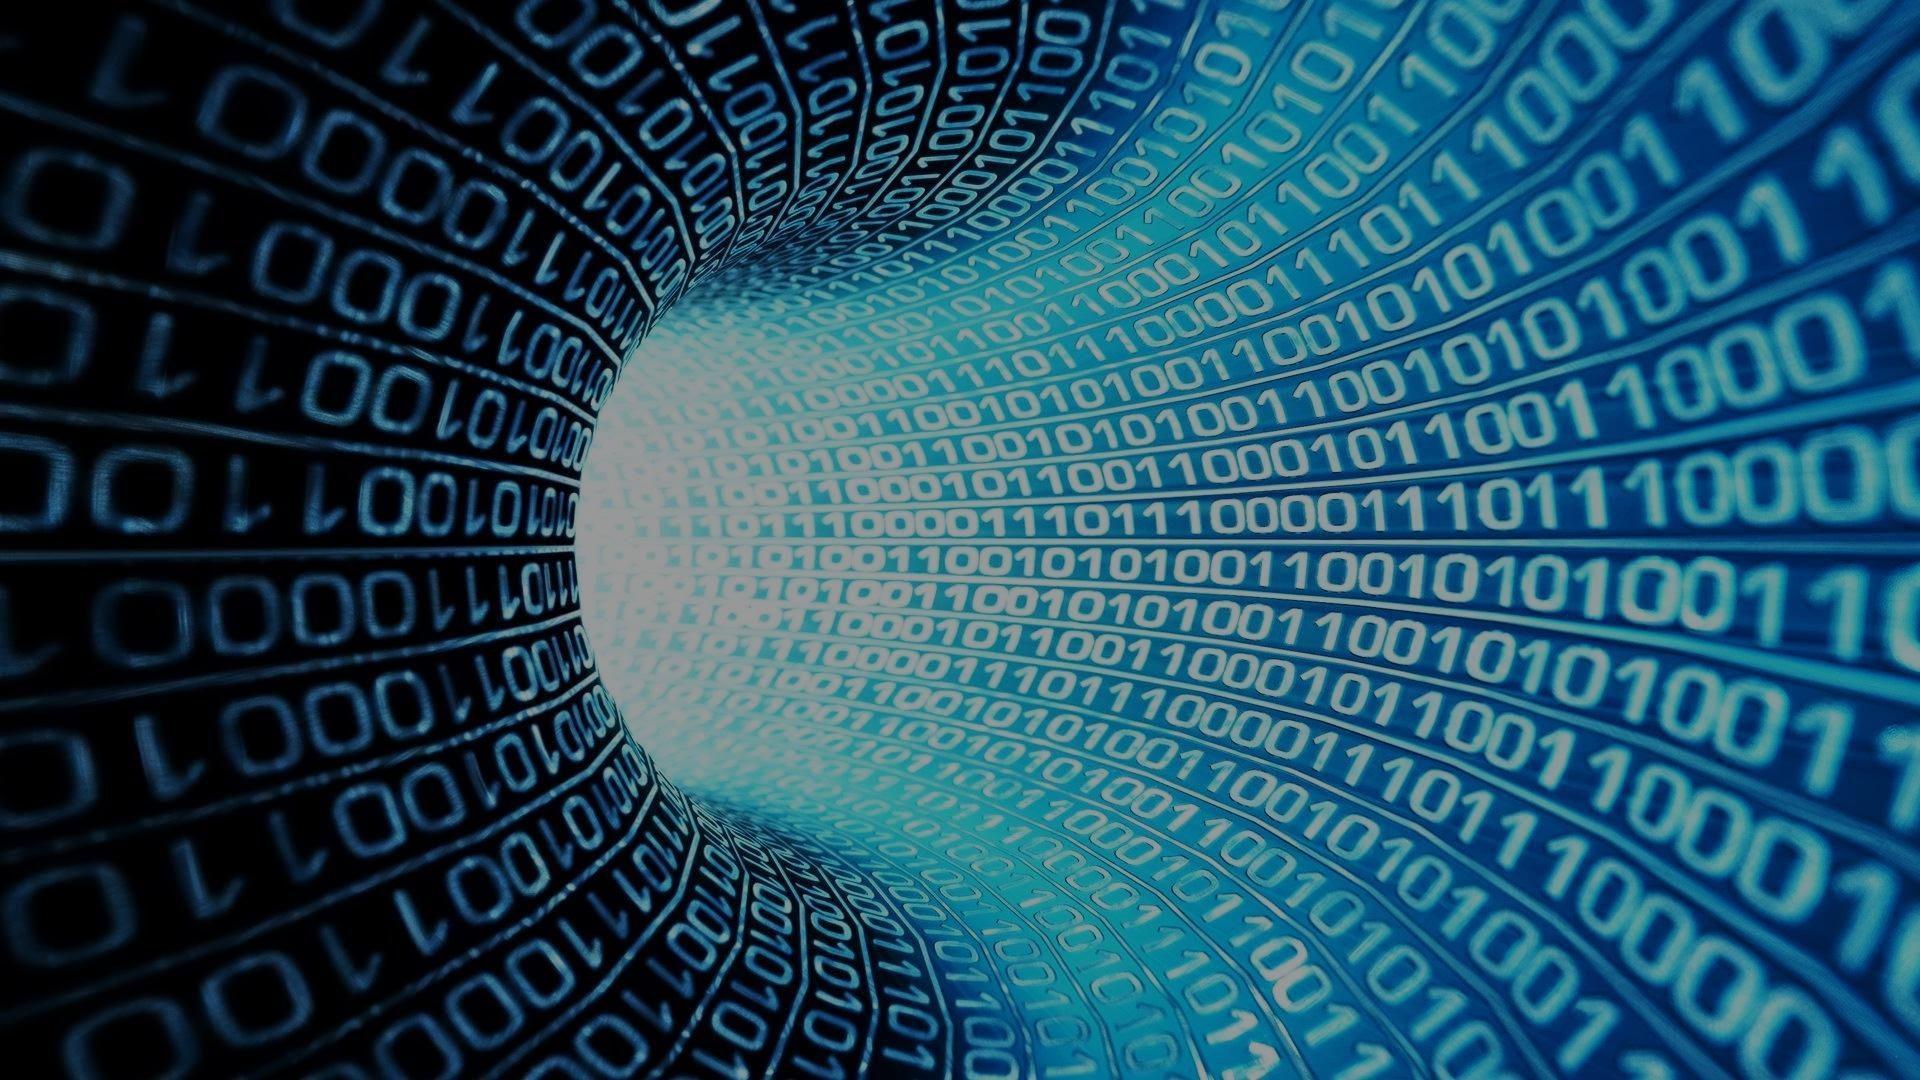 19 sistemas informaticos